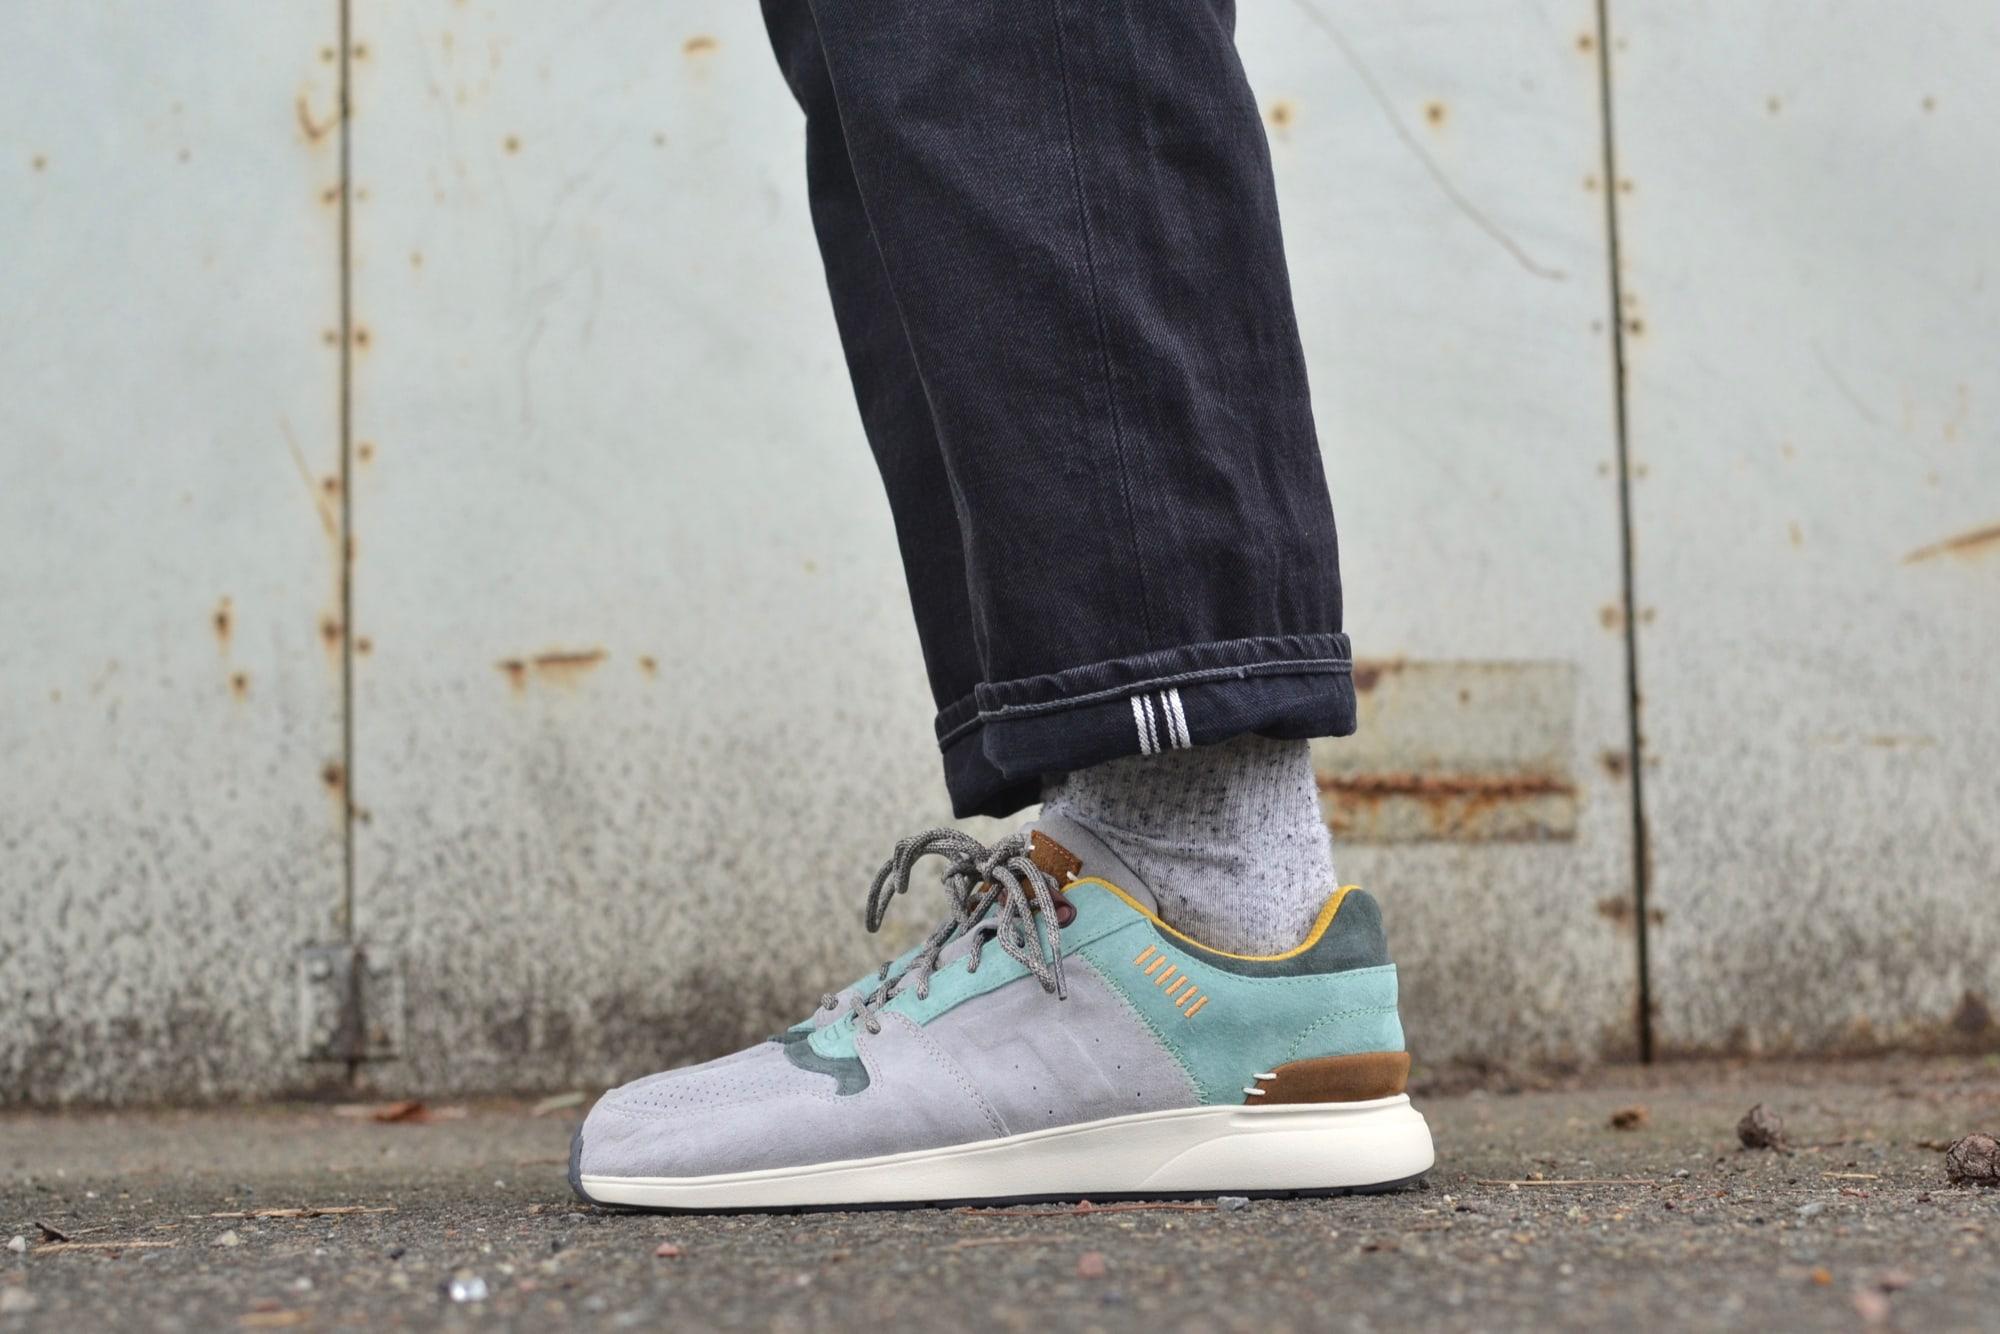 borasification blog mode - TOMS x Star-Wars-sneakers-exclisivité-nous-paris-inspired-Boba-Fett-helmet-visvim-black-denim-heritage-research-parka - 7